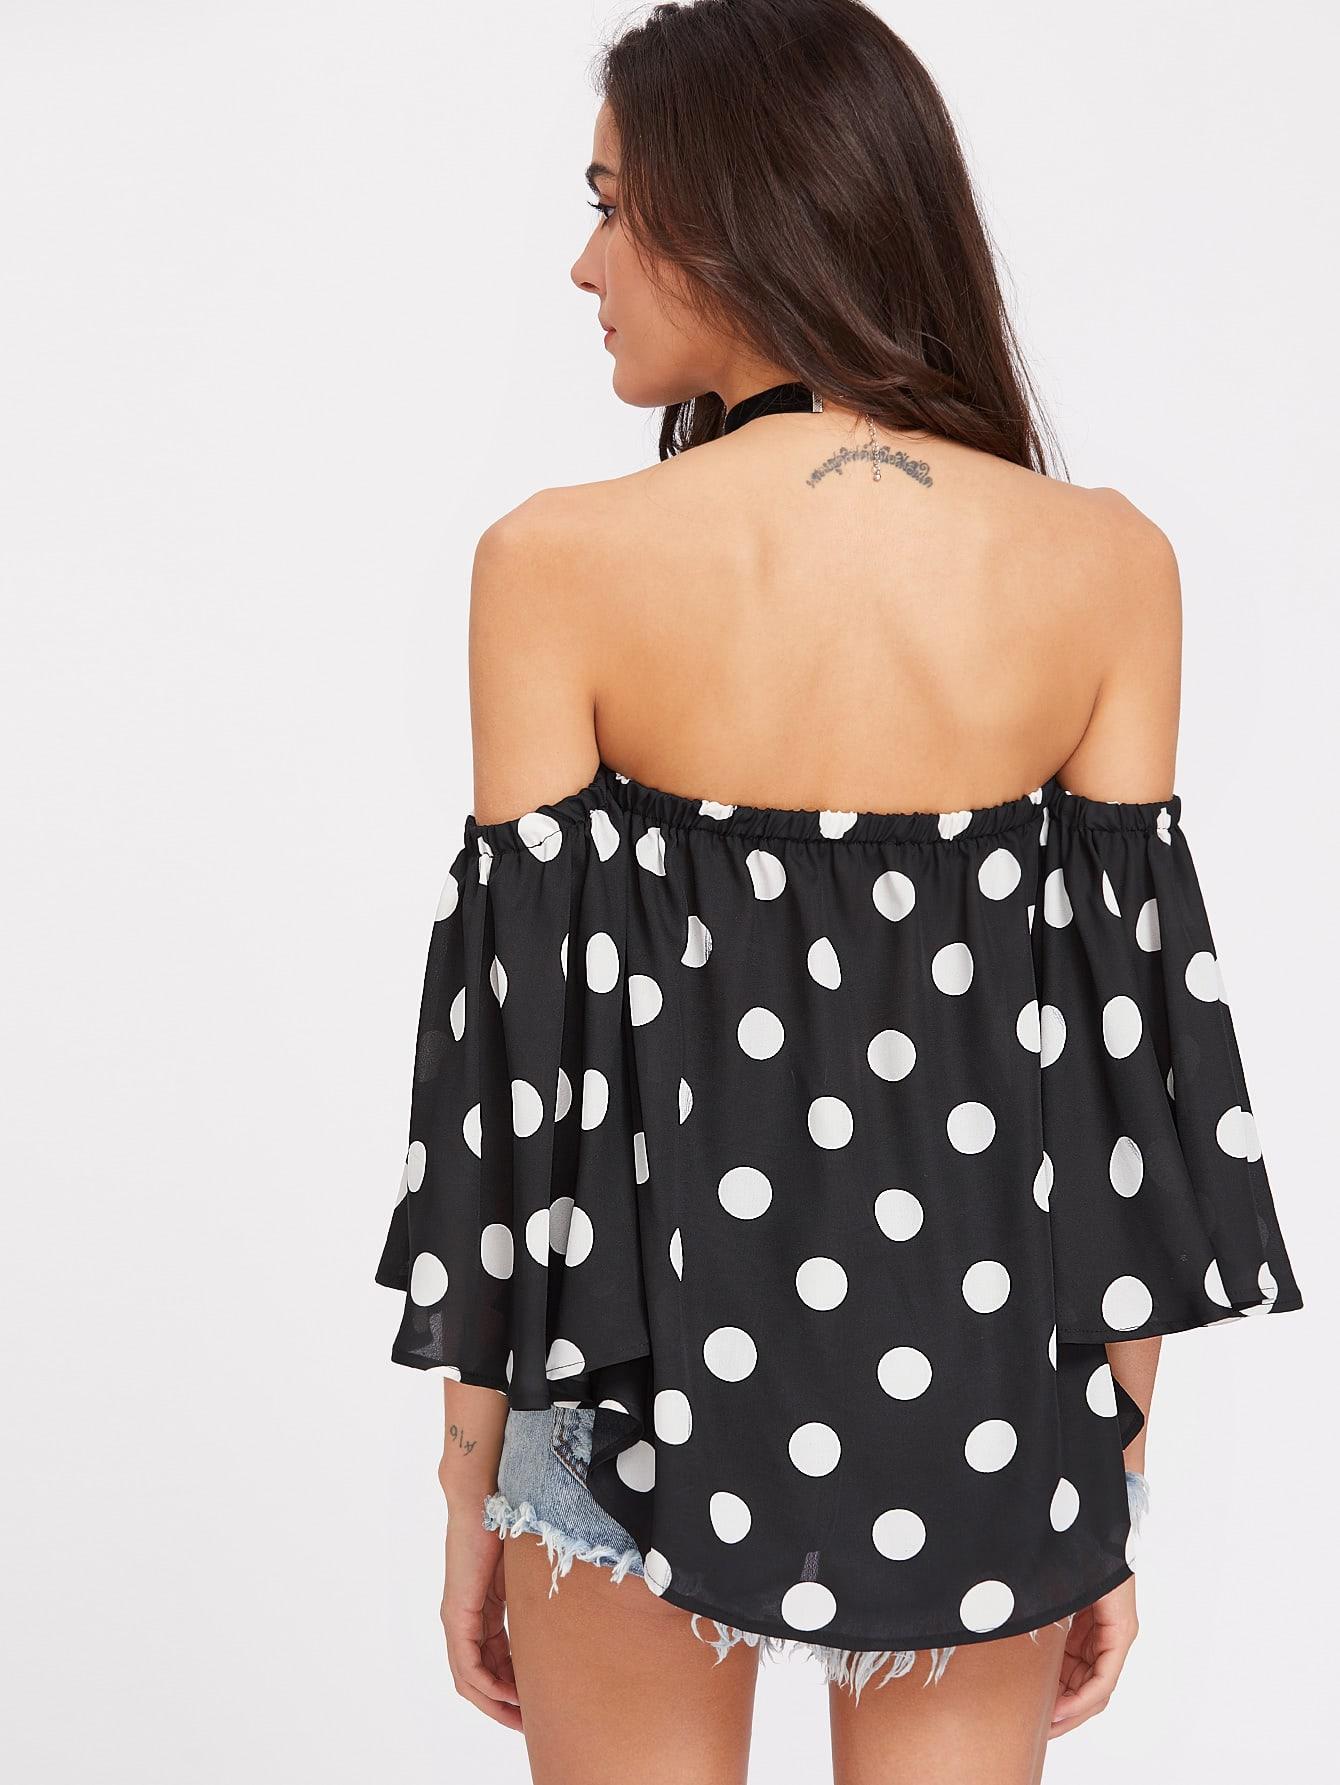 blouse170412450_2